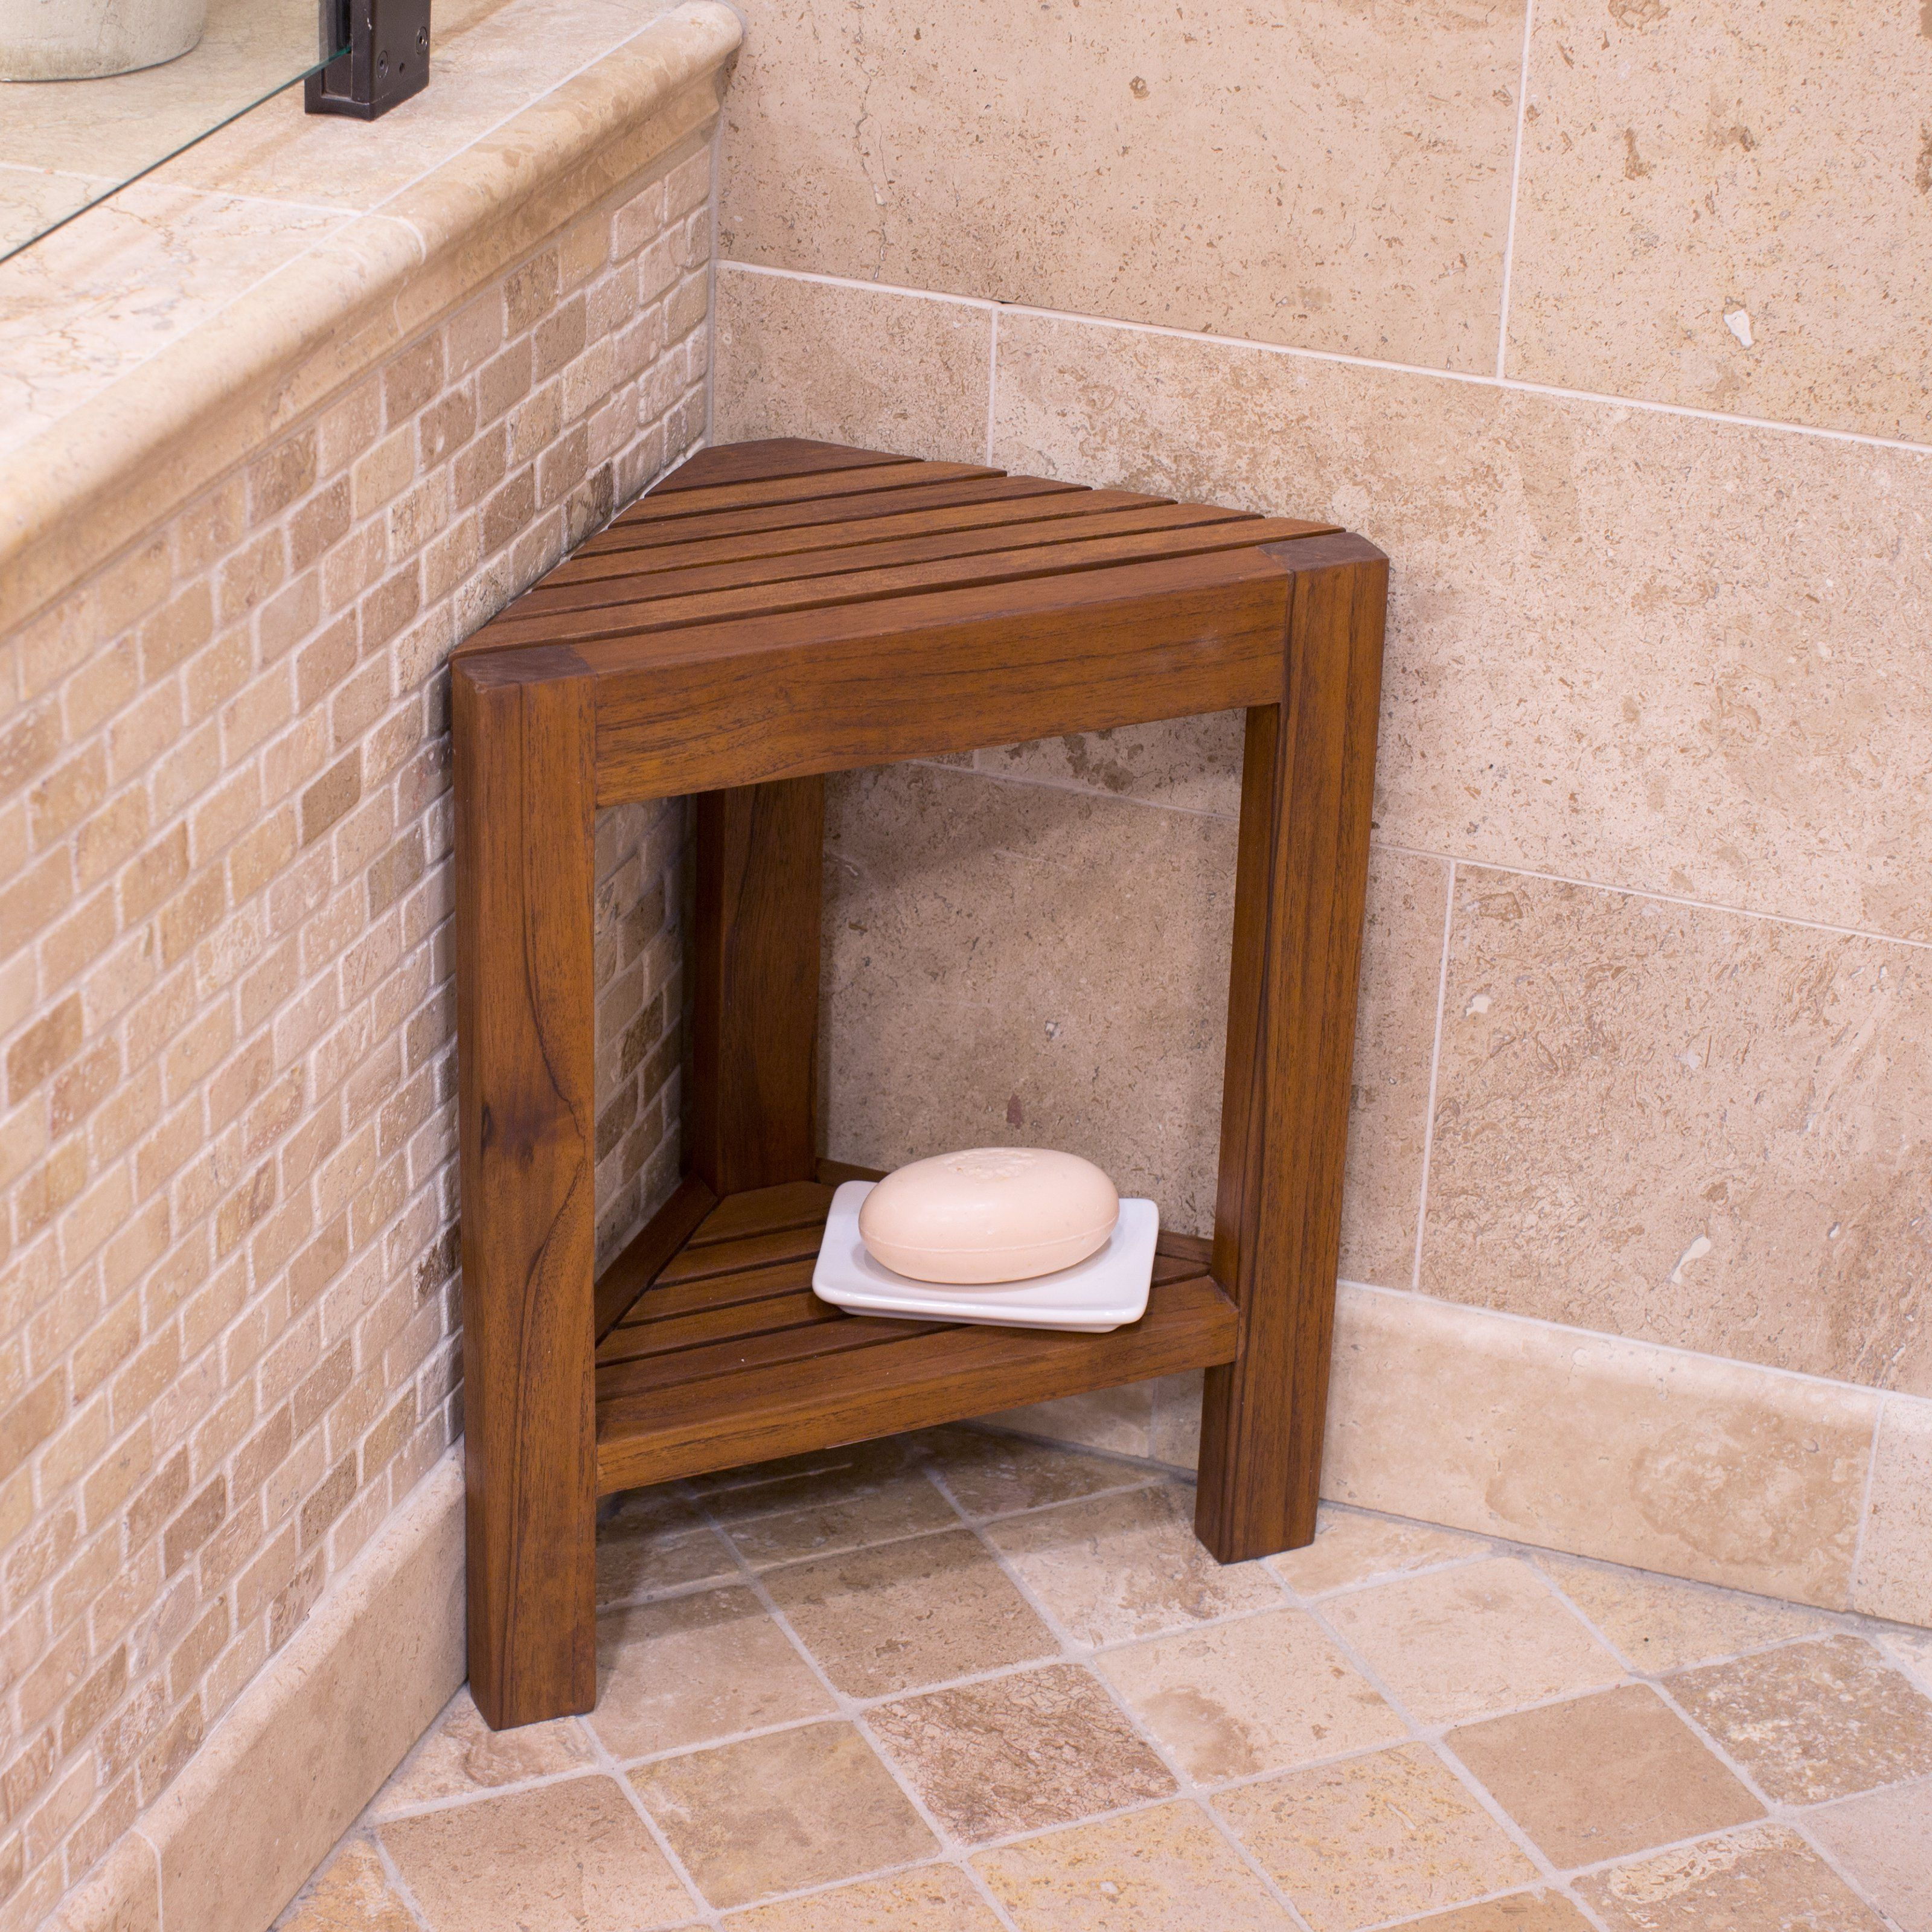 Belham Living Corner Teak Shower Bench With Shelf   Bathtub U0026 Shower  Accessories At Hayneedle